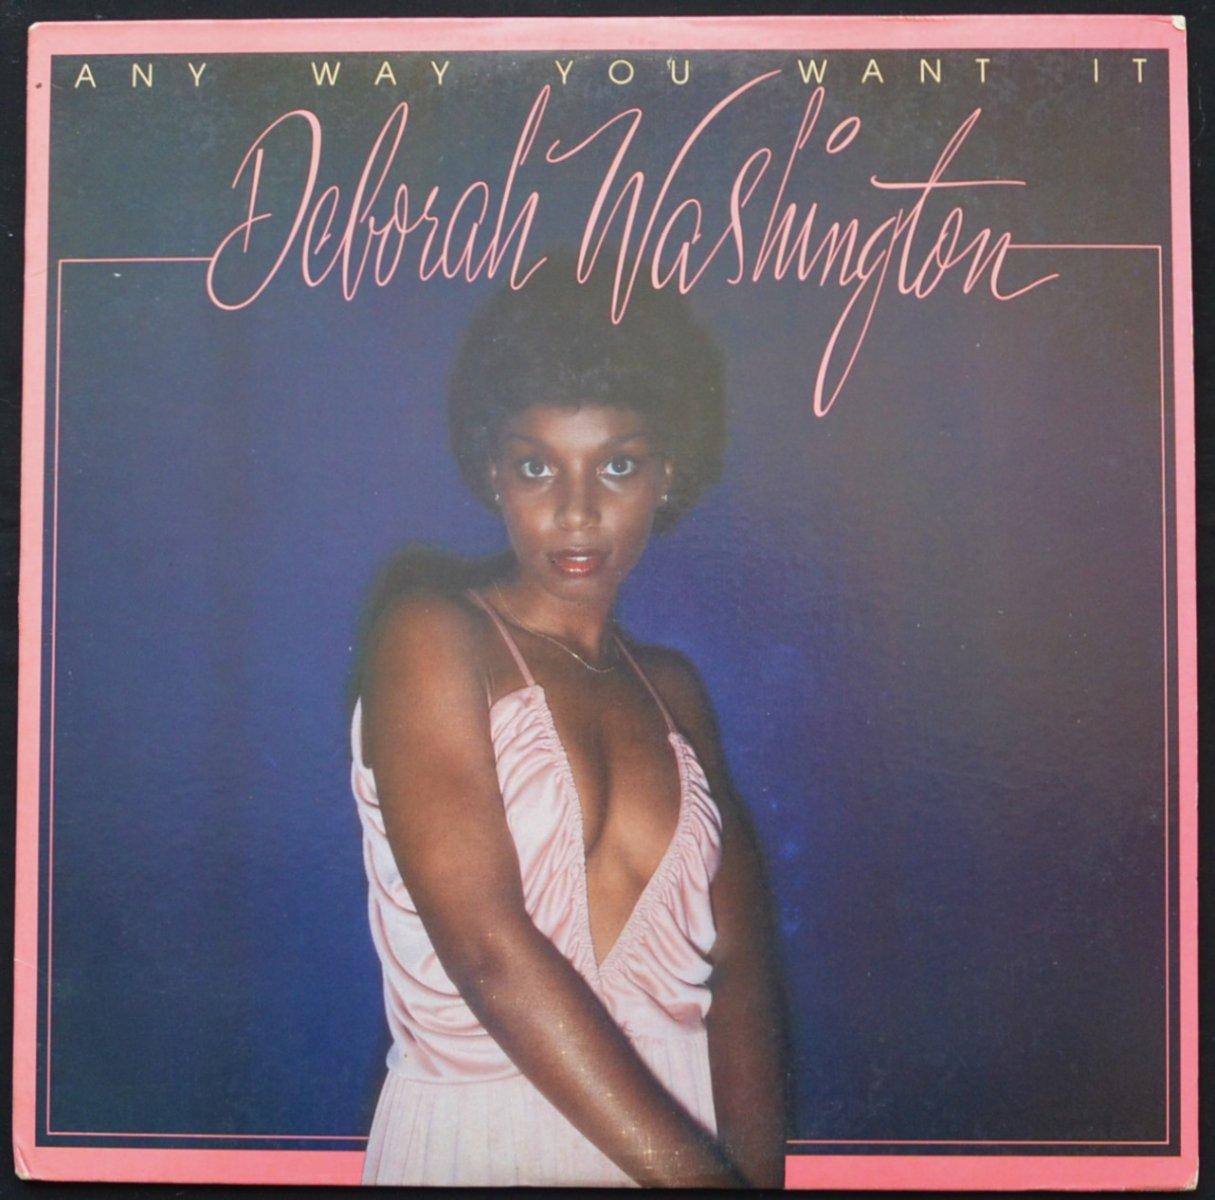 DEBORAH WASHINGTON / ANY WAY YOU WANT IT (LP)